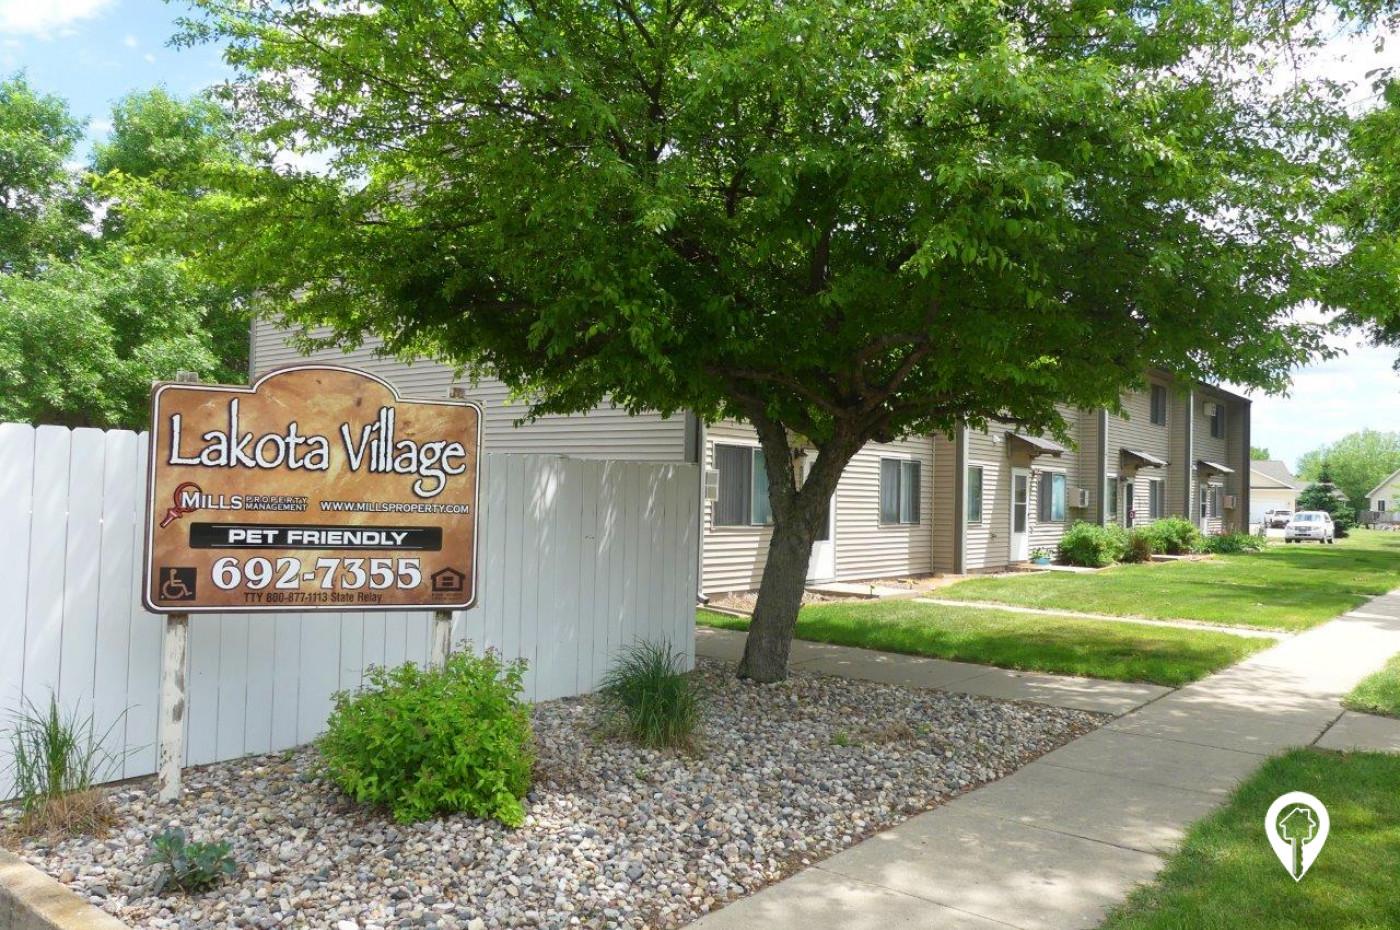 Lakota Village Townhomes